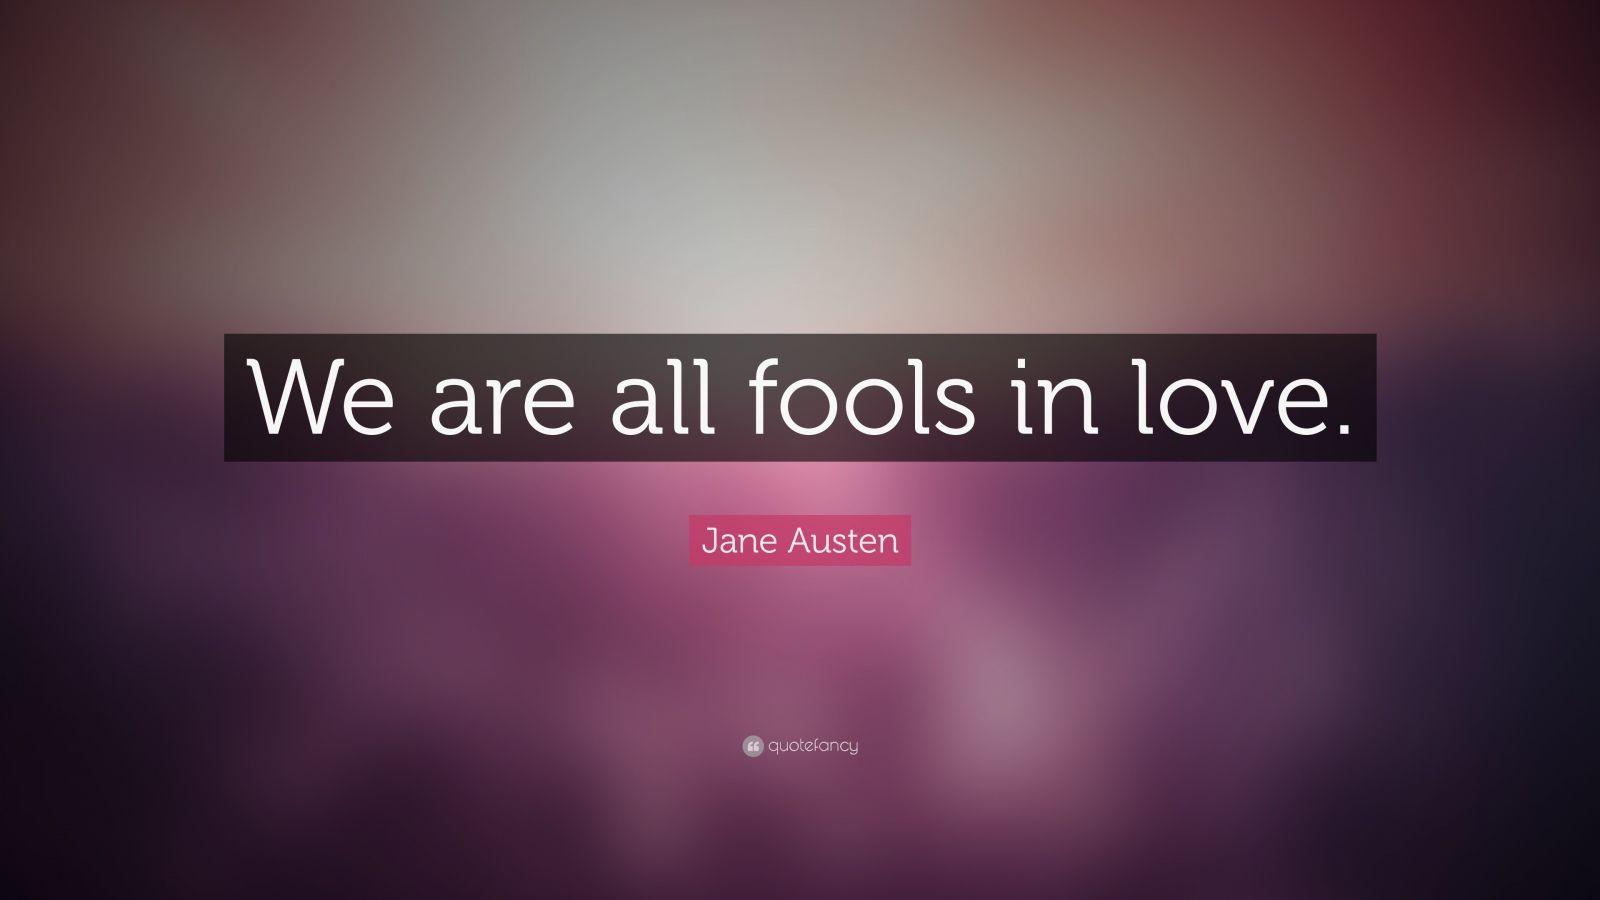 Jane Austen Quotes On Love